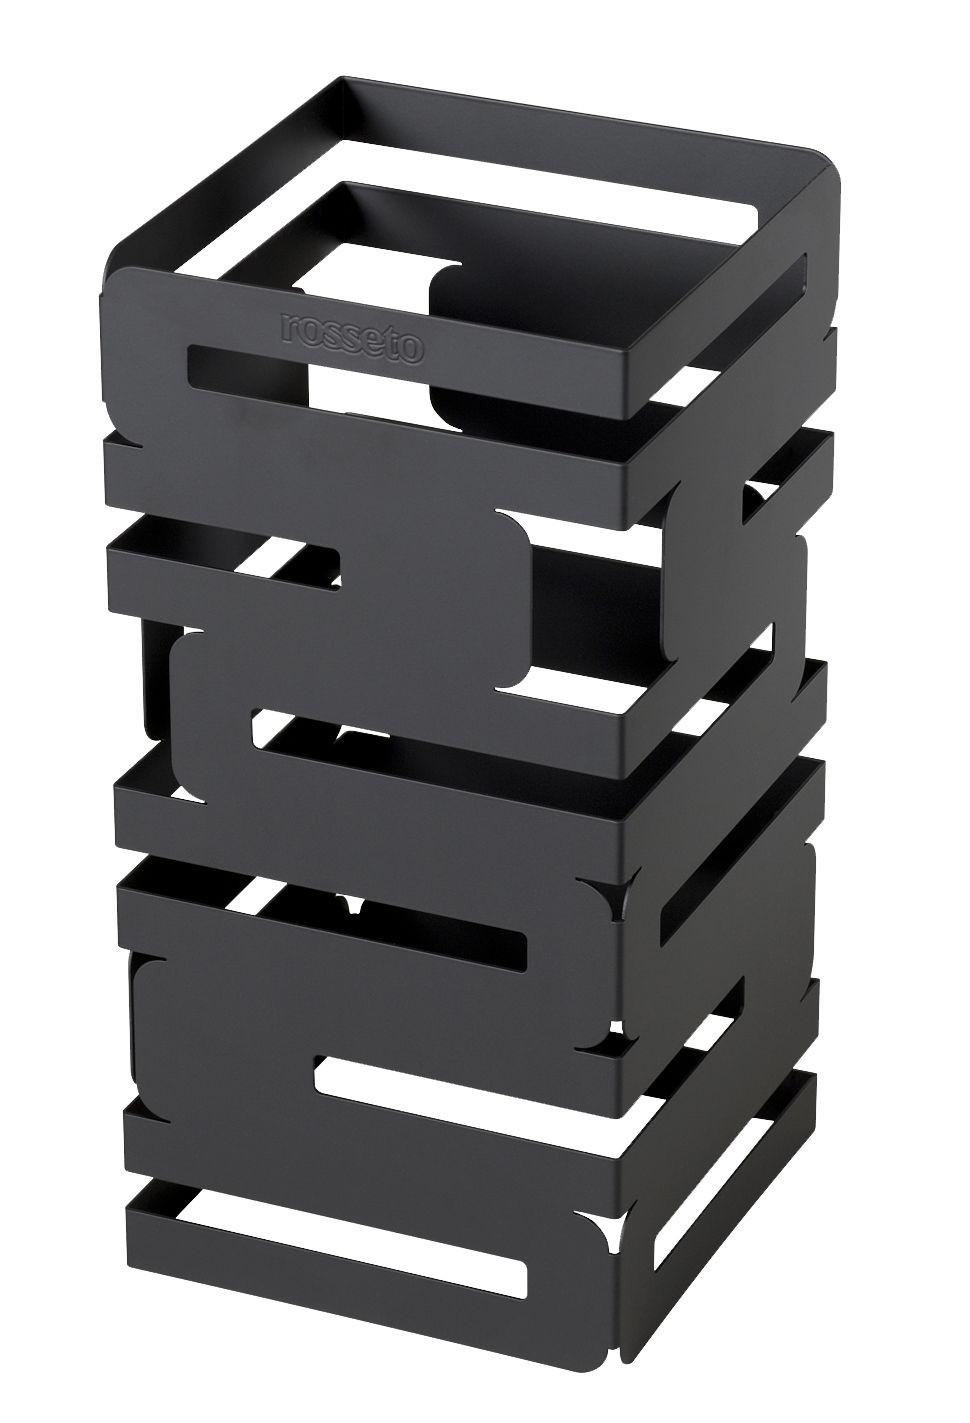 "Rosseto D620RB Skycap Black Matte Steel Finish Square Multi-Level Riser 6"" x 6"" x 12""H"